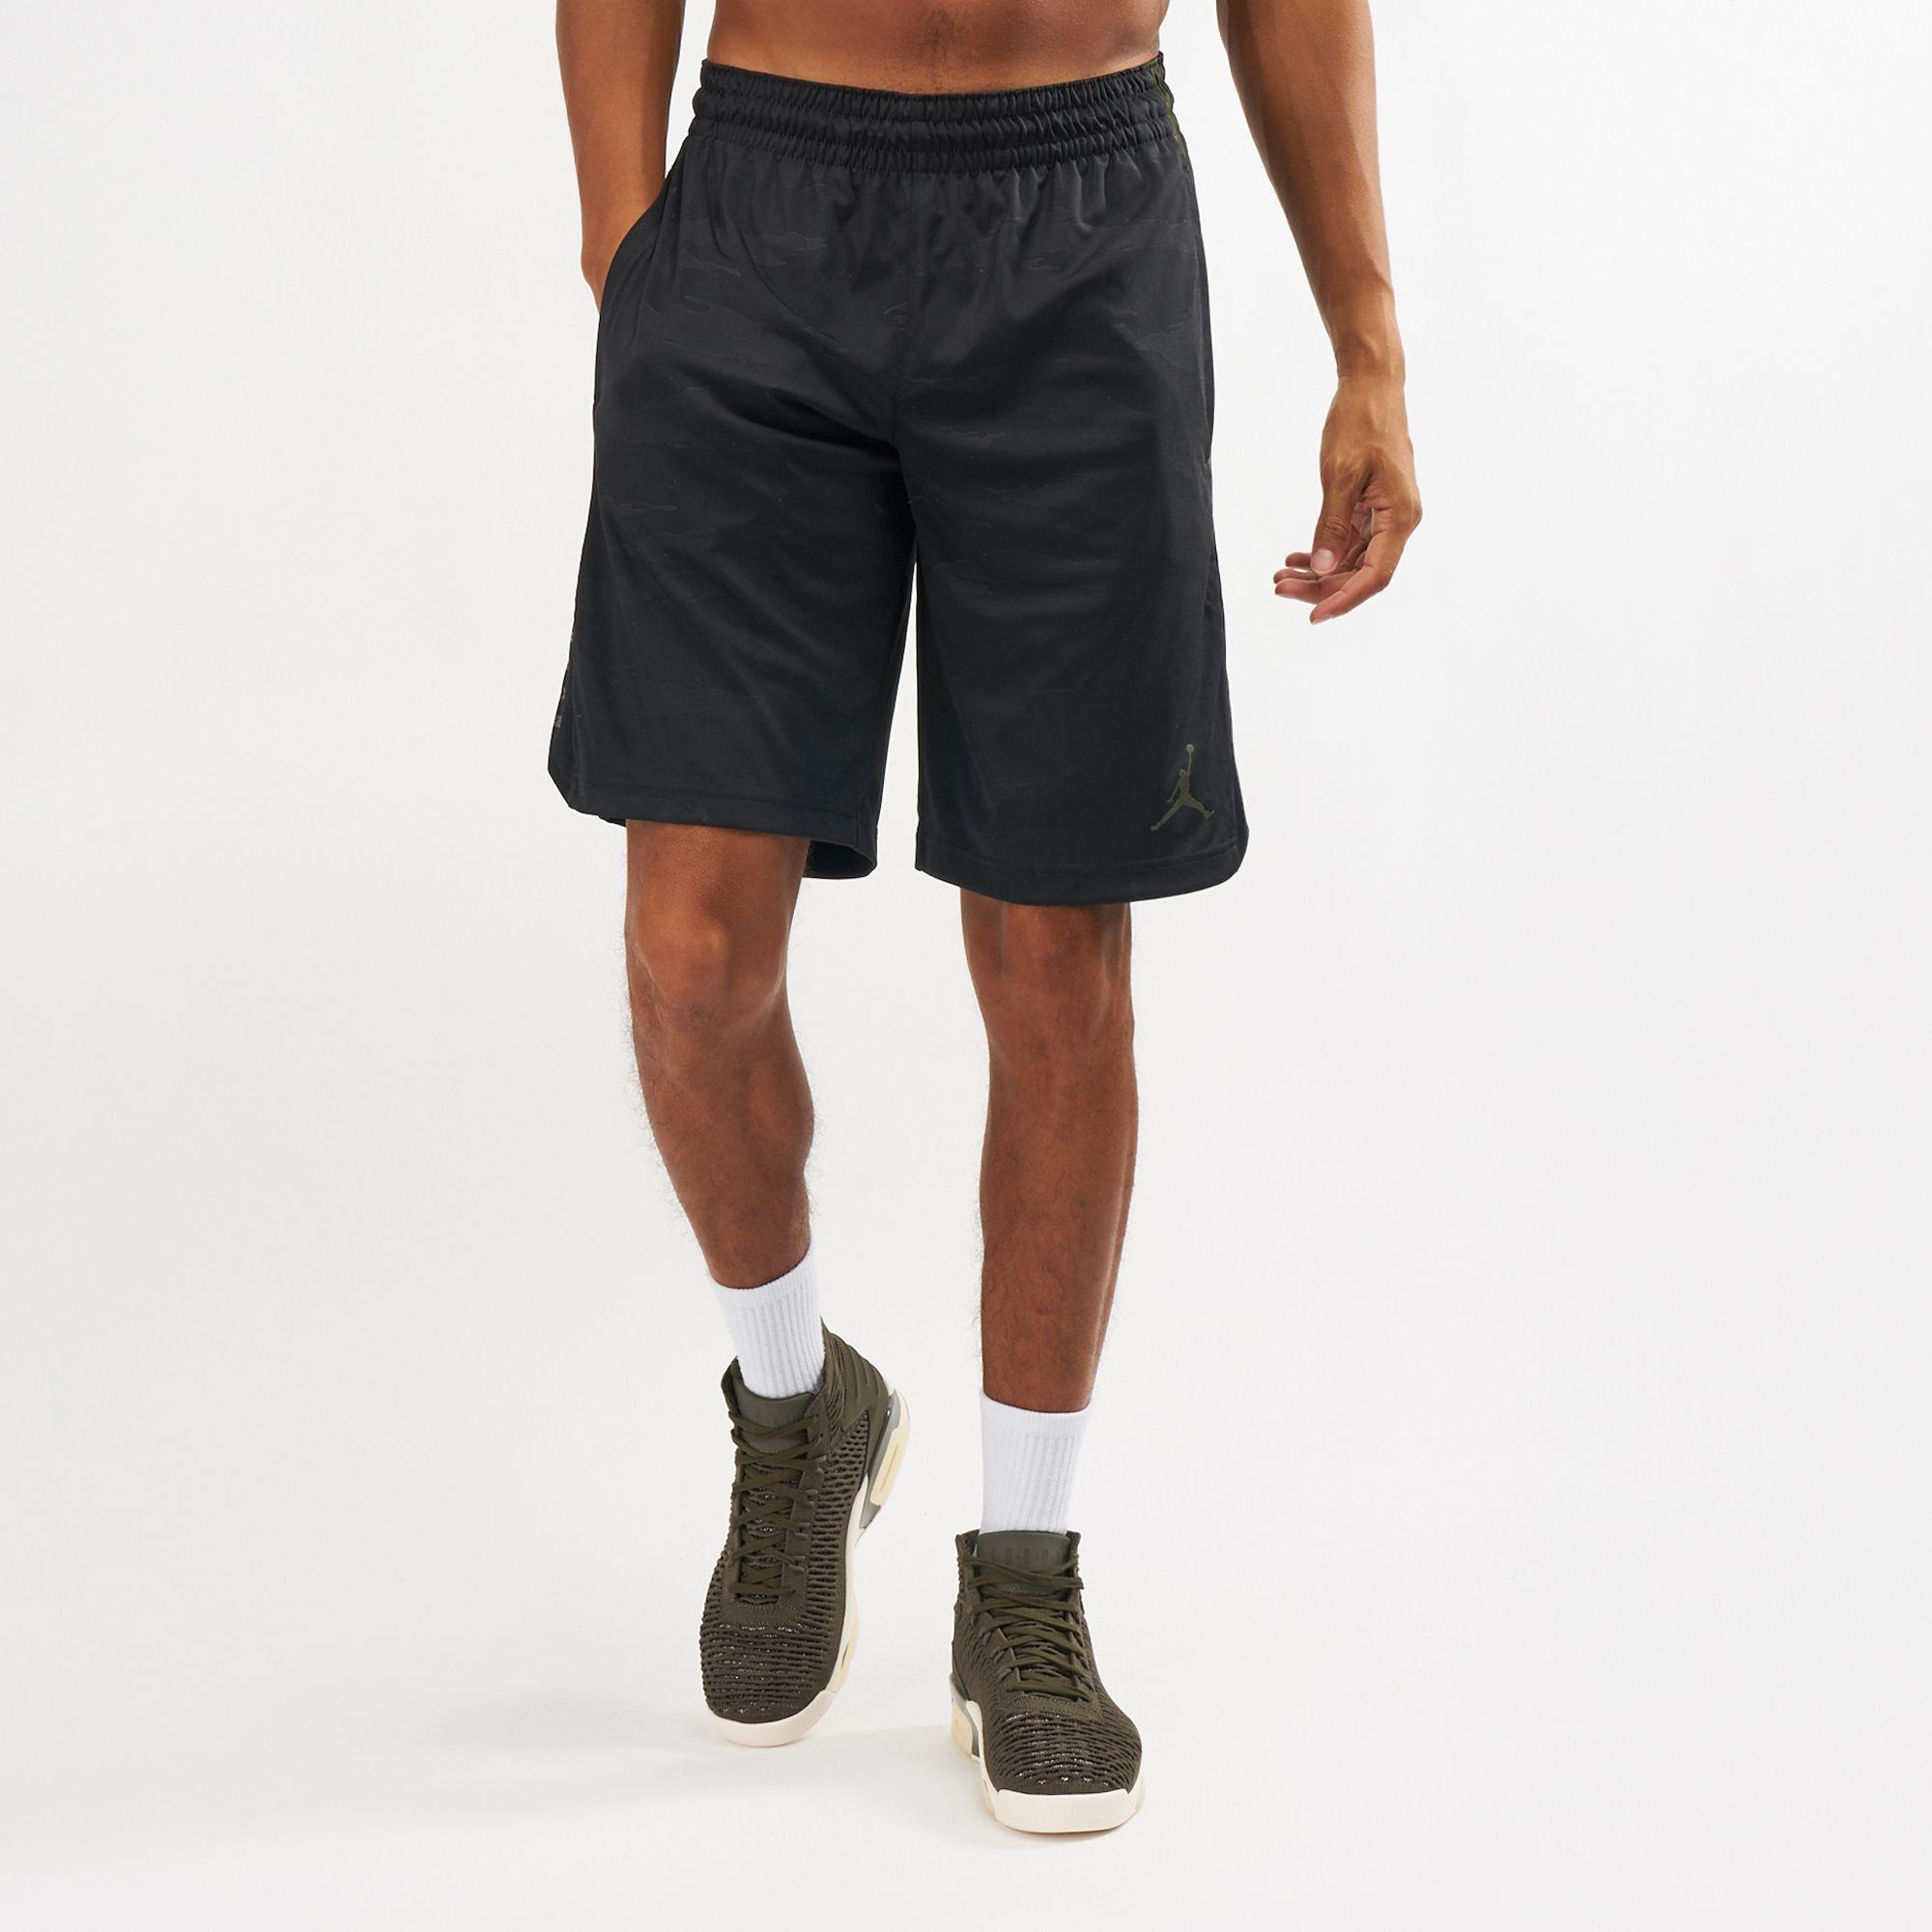 d42b6828380 Jordan Dri-FIT 23 Alpha Knit Basketball Shorts | Shorts | Clothing ...